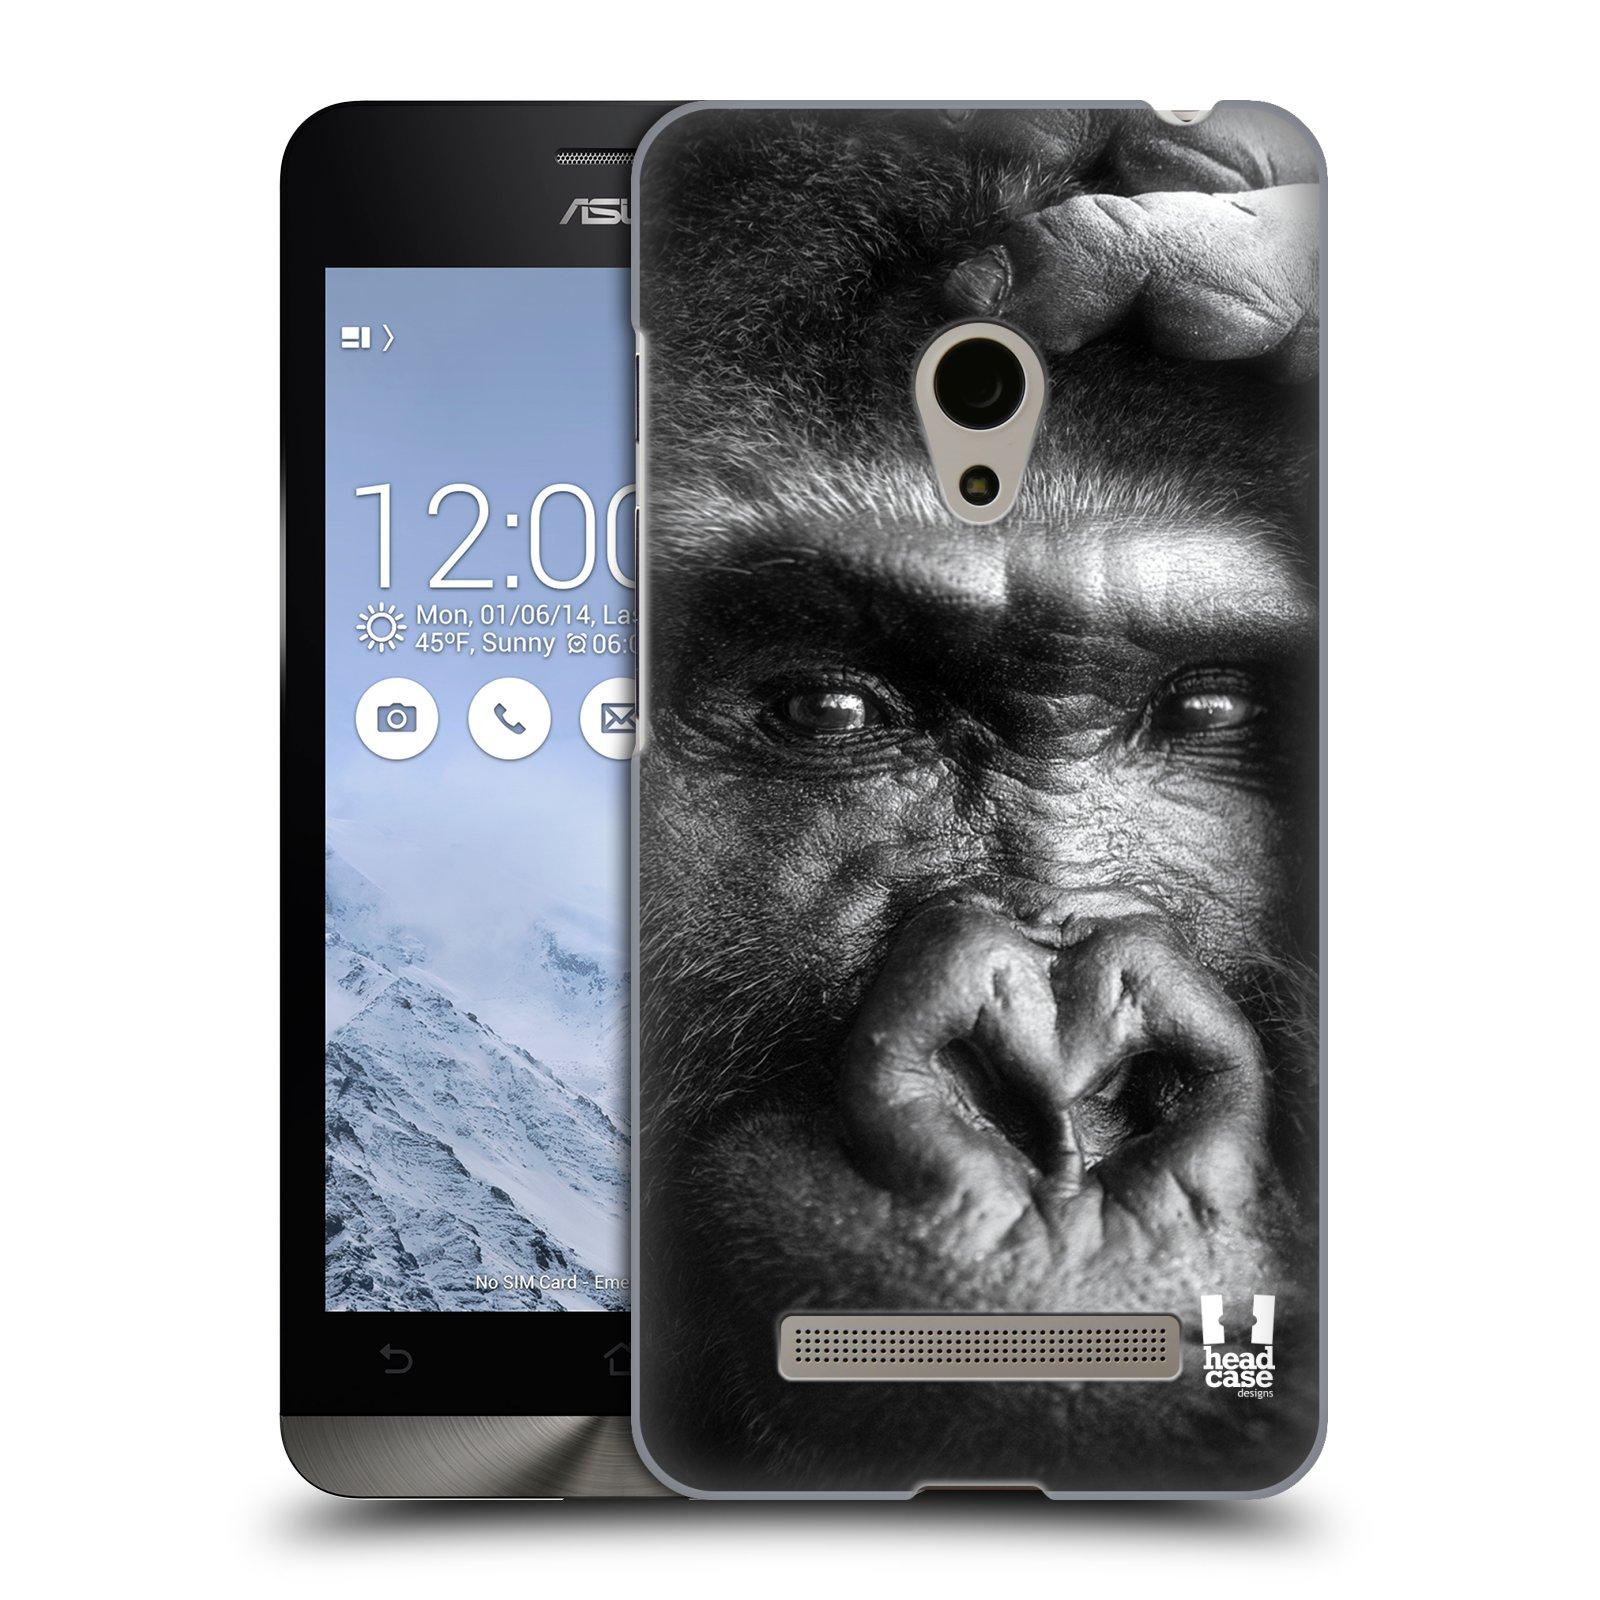 HEAD CASE plastový obal na mobil Asus Zenfone 5 vzor Divočina, Divoký život a zvířata foto GORILA TVÁŘ